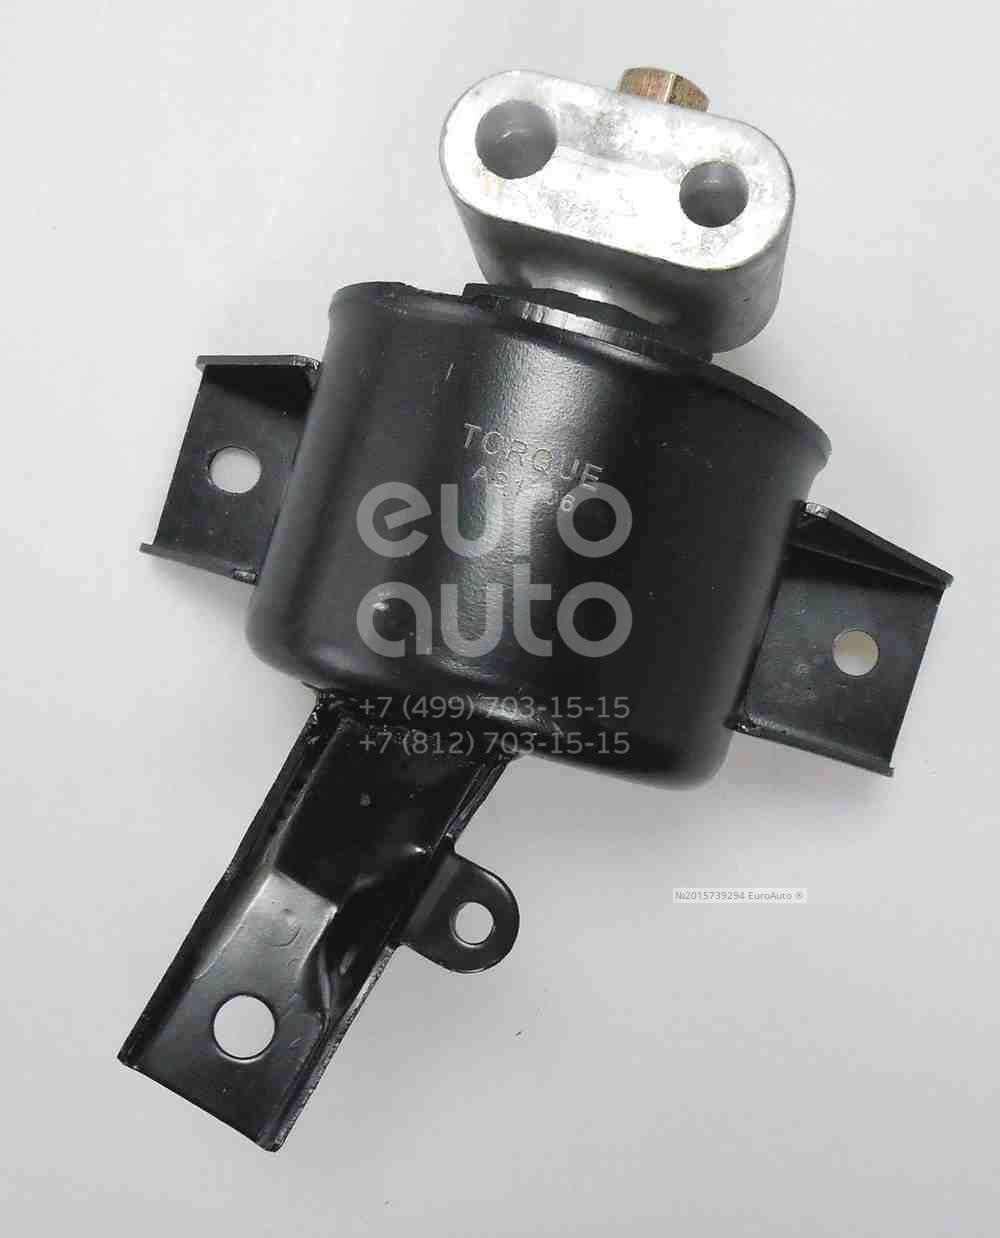 Опора КПП левая для Chevrolet Aveo (T250) 2005-2011 - Фото №1